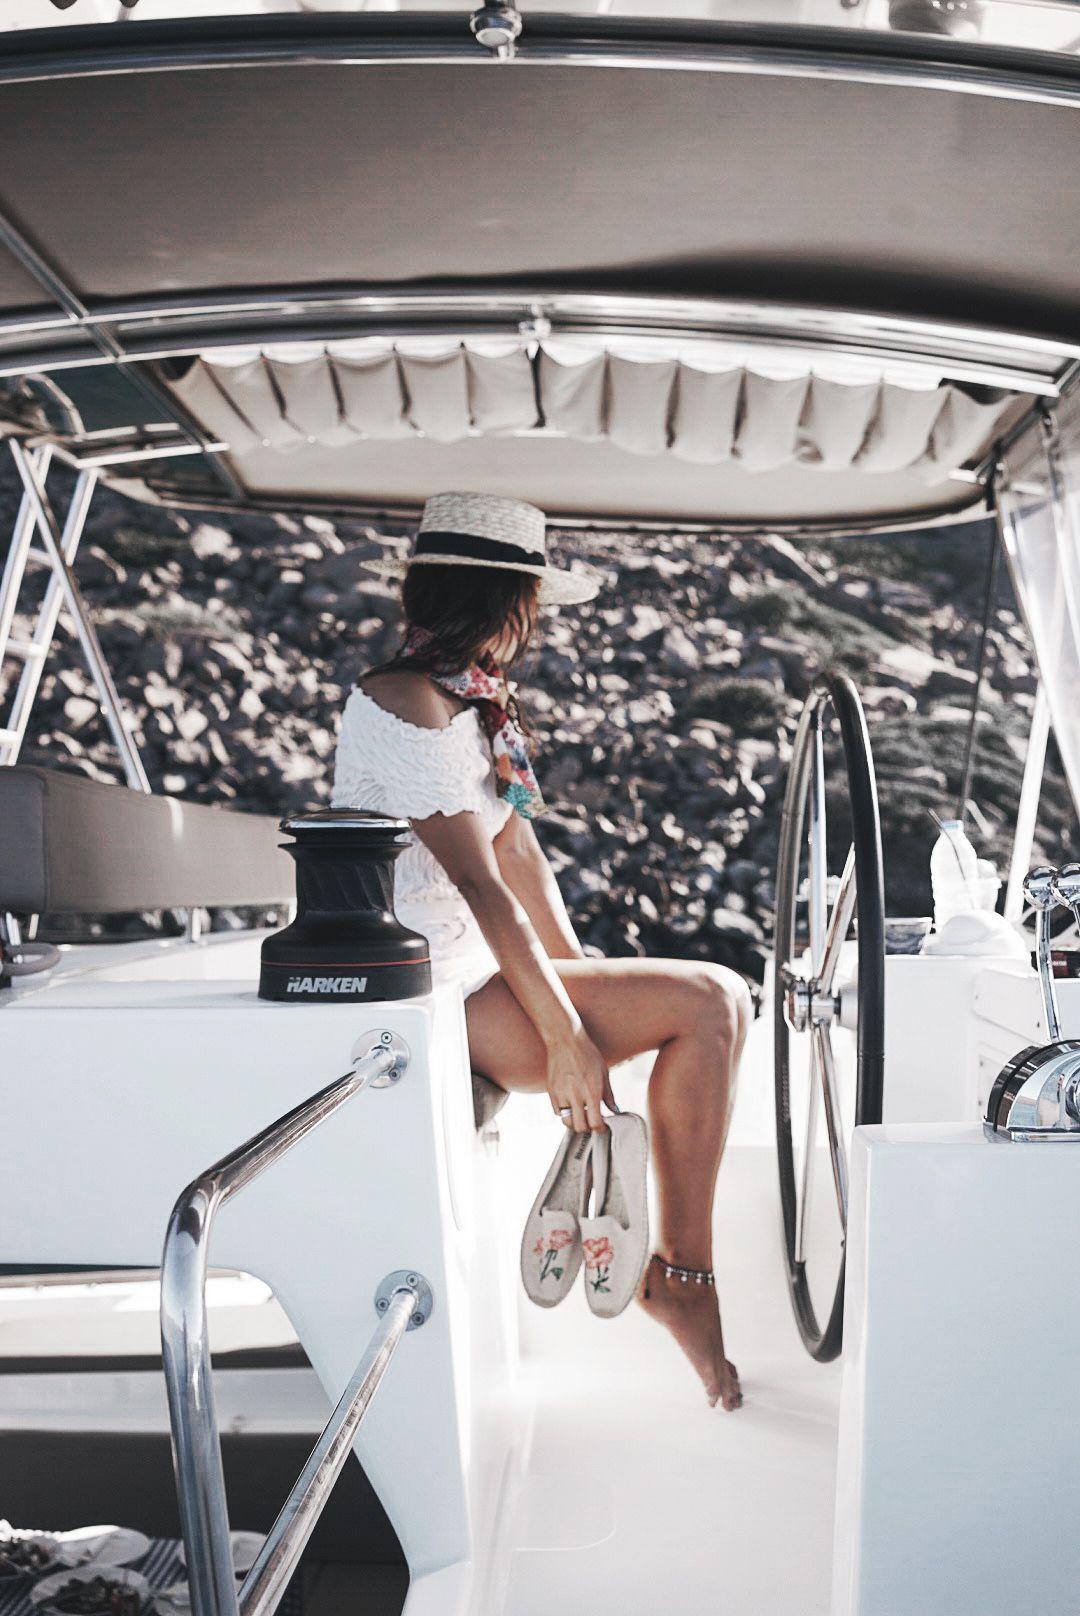 Soludos_Escapes-Boat_Trip-Bikini-Summer_Look-Santorini_Greece-GRLFRND_Jeans-Off_The_Shoulders-Collage_Vintage-Street_Style-Soludos_Espadrilles-29